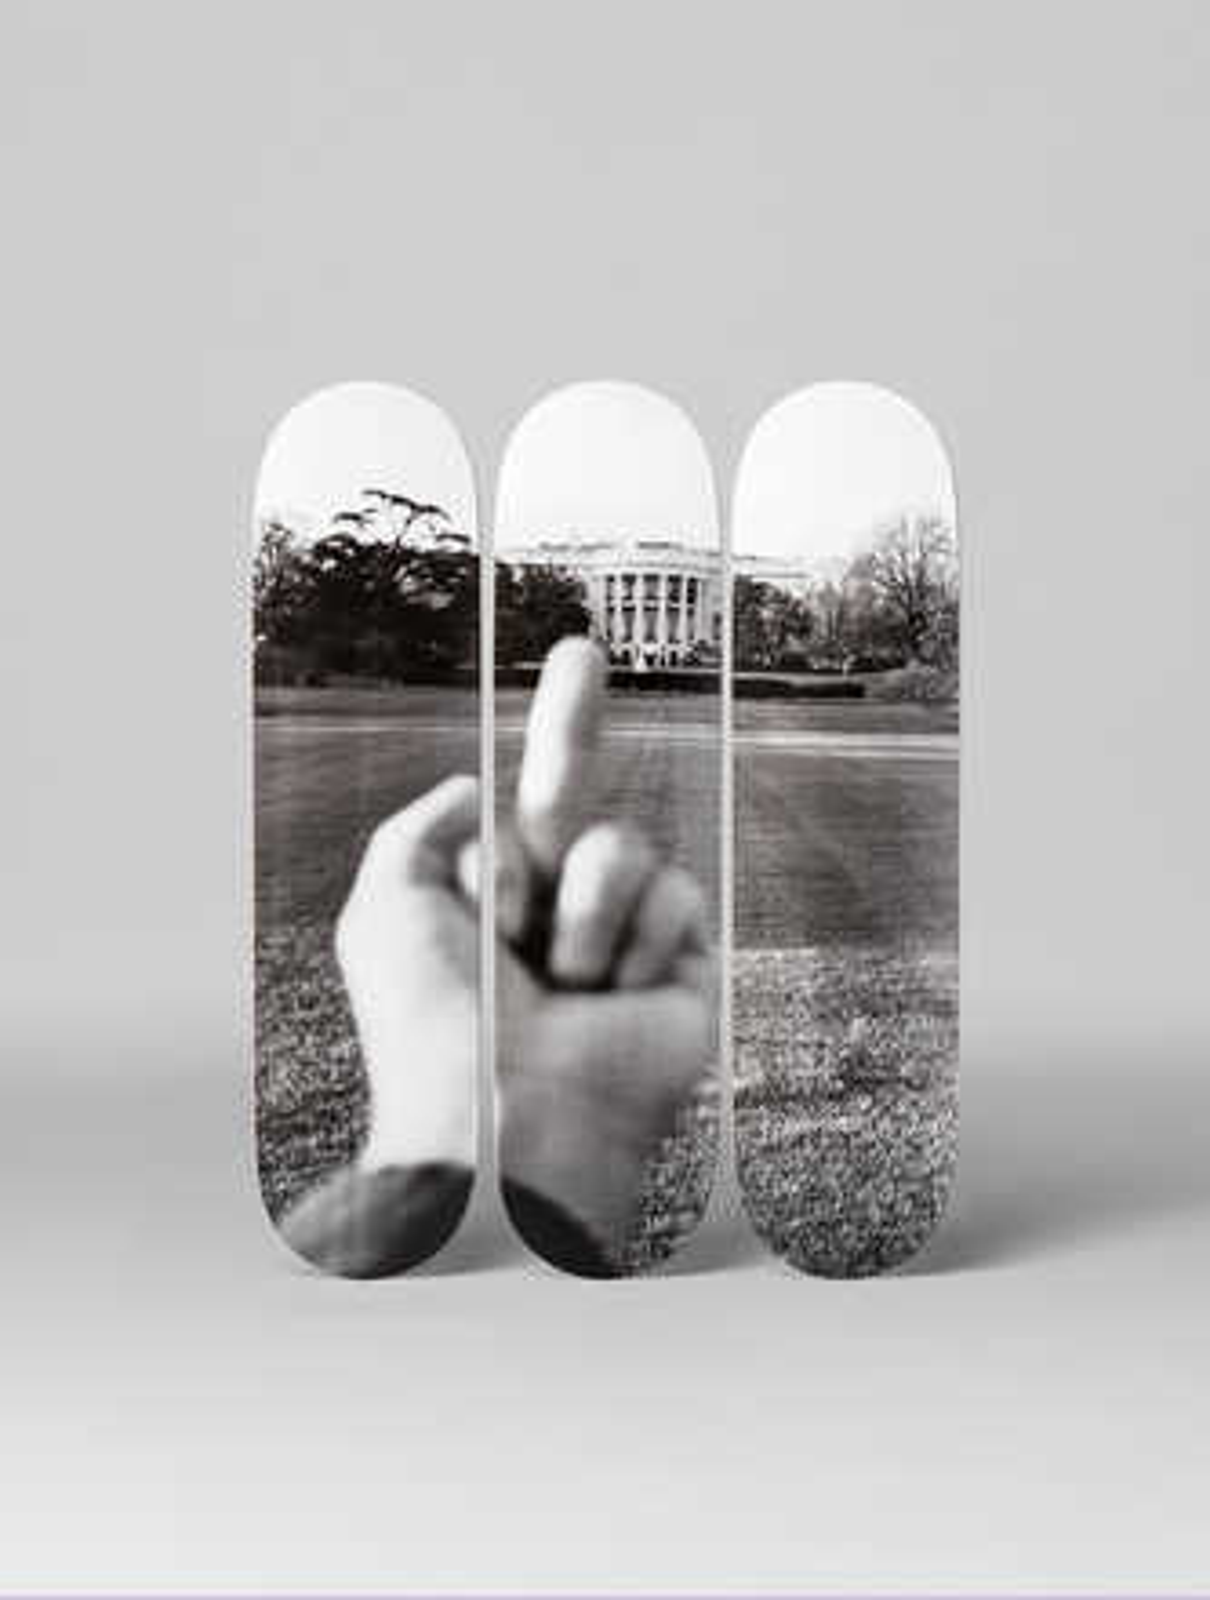 White House - Ai Weiwei